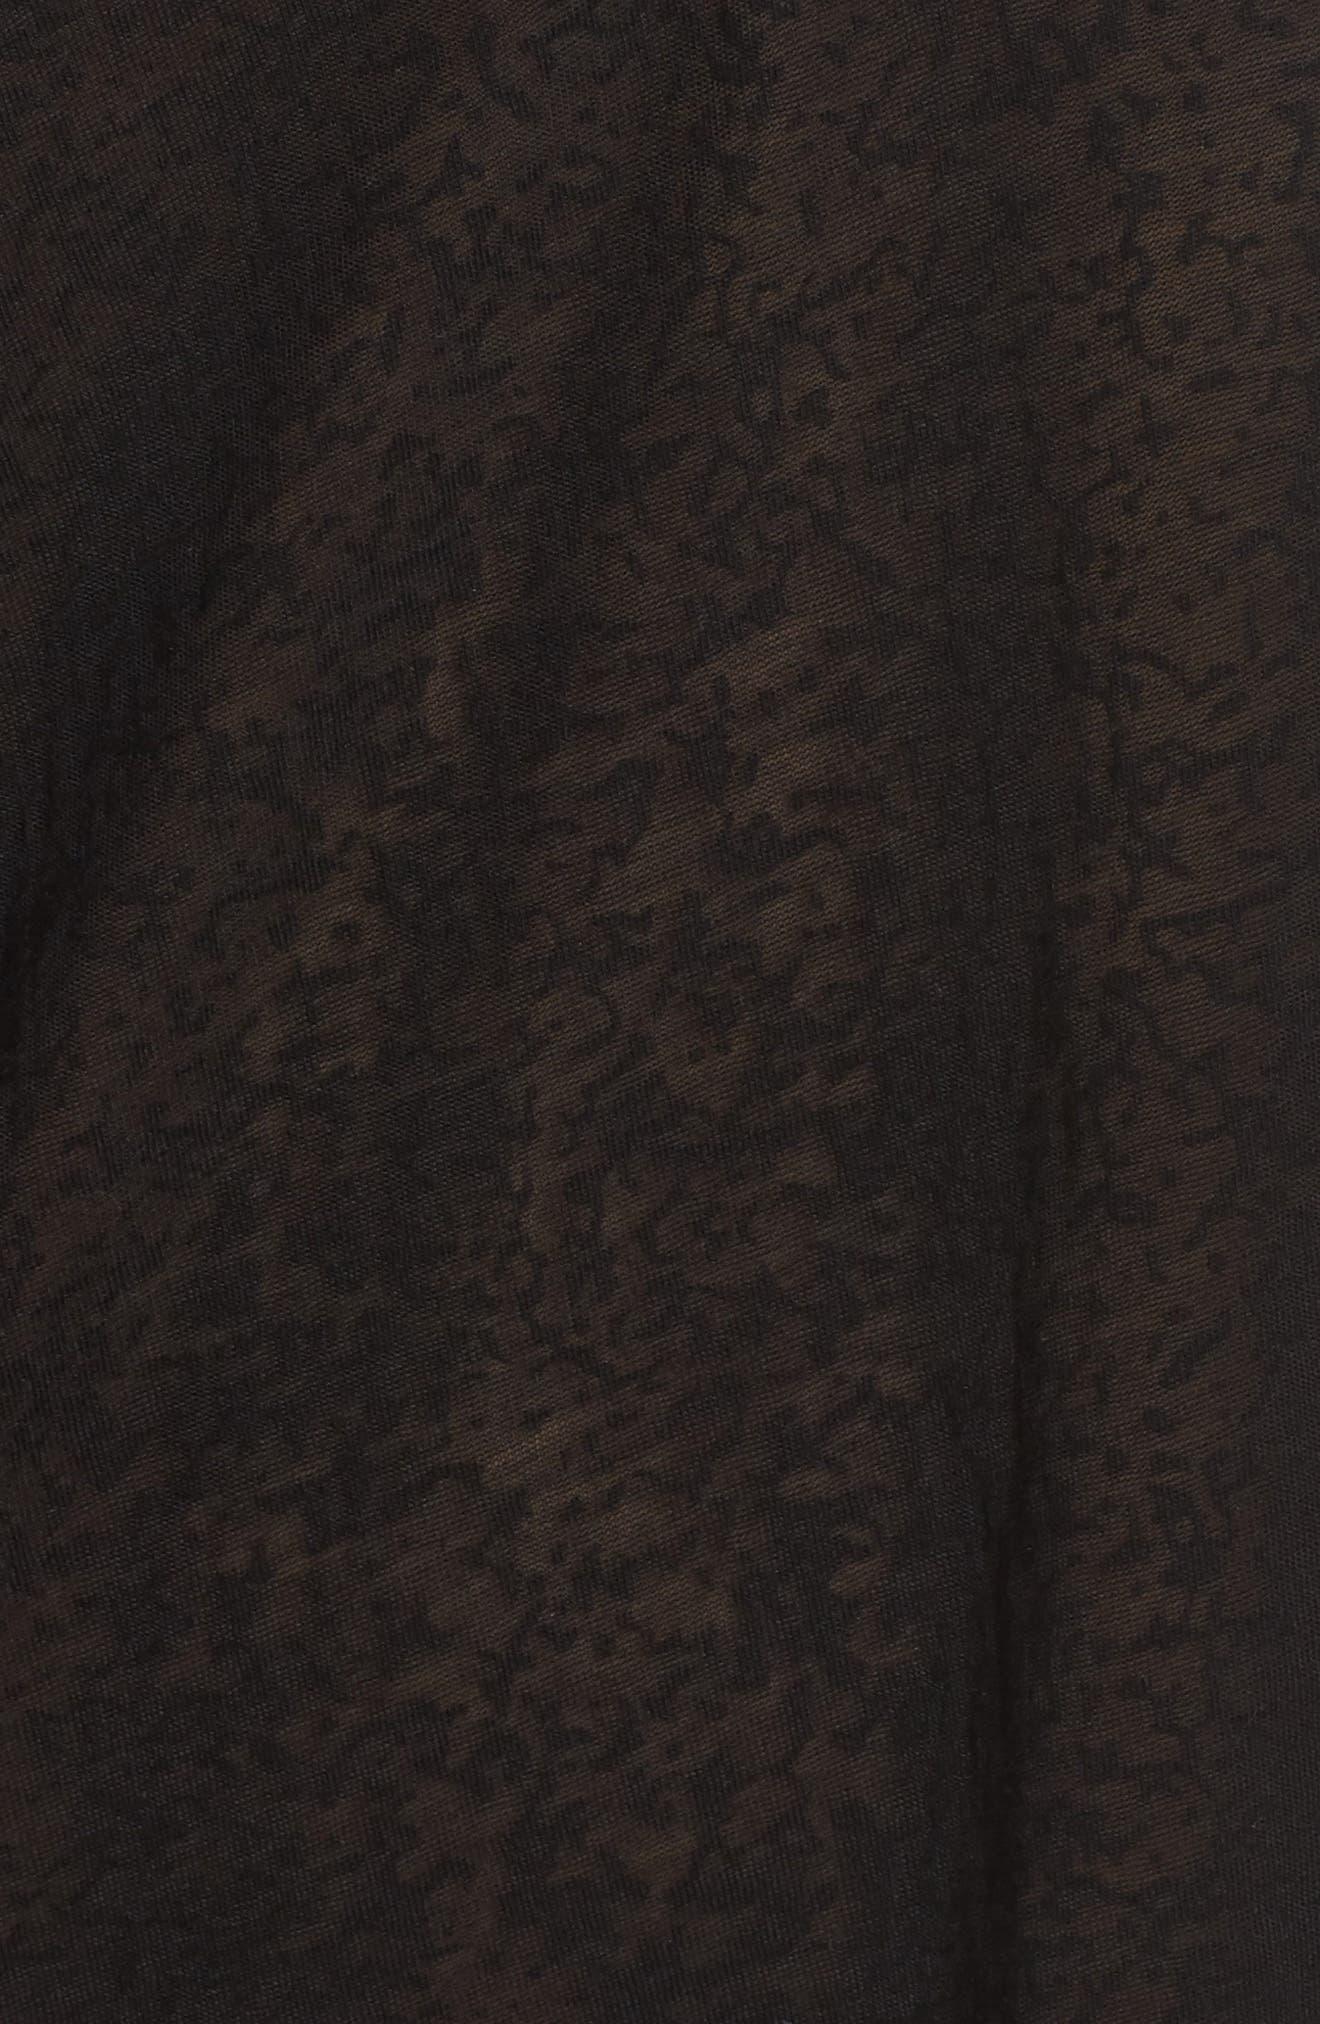 Inca Cover-Up Dress,                             Alternate thumbnail 5, color,                             Black